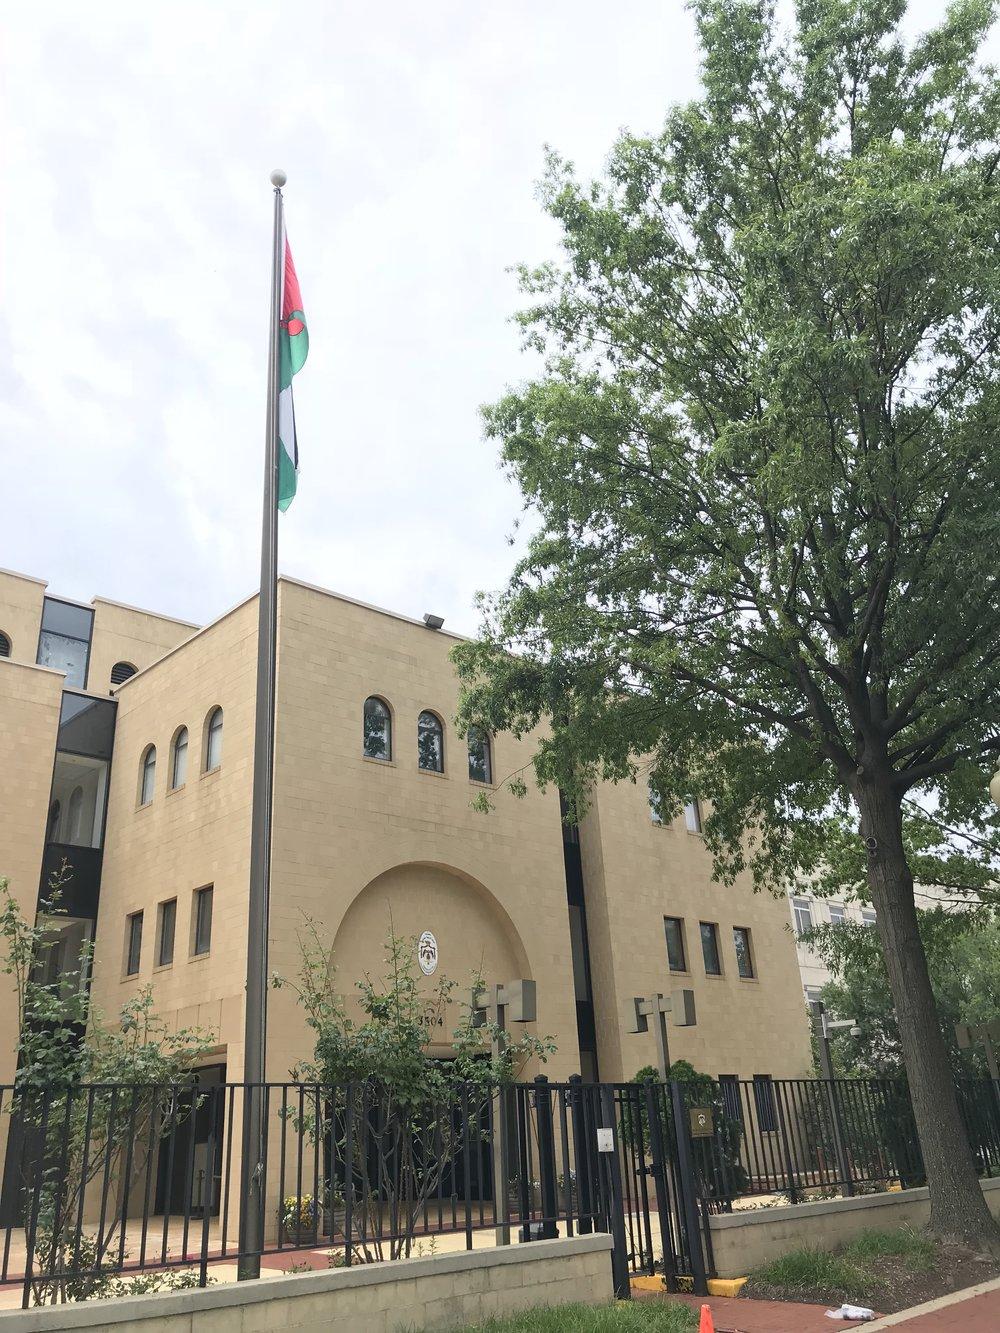 The Embassy of Jordan.